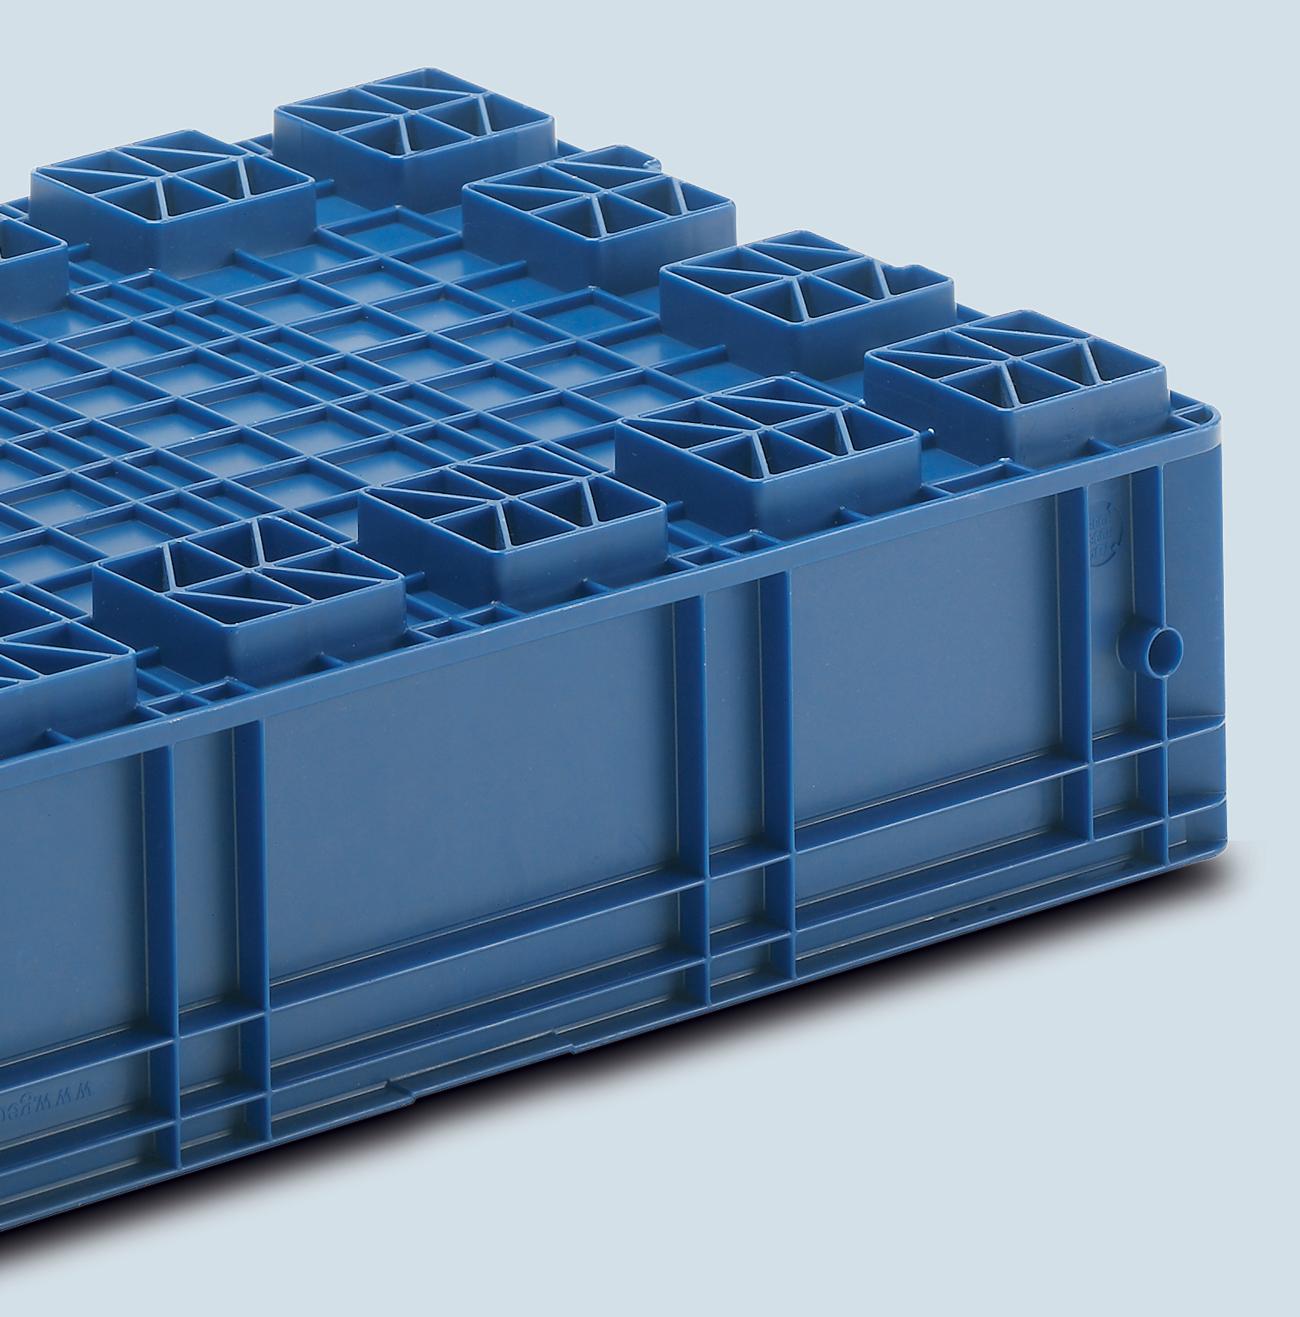 Plastic Container VDA-R-KLT 6420, Automotive Industry